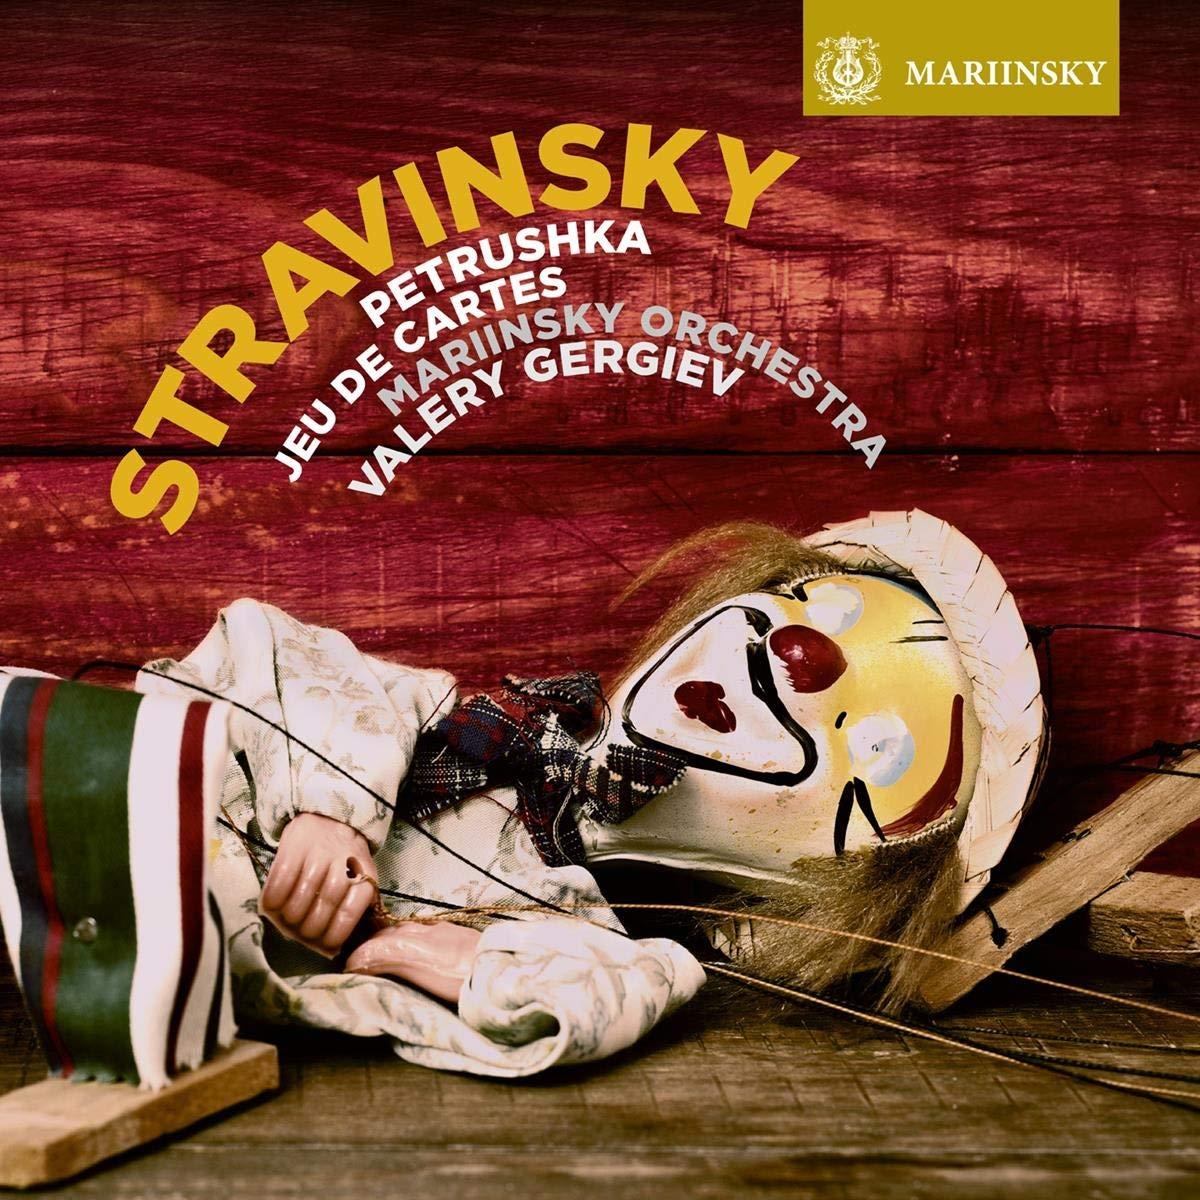 SACD : MARIINSKY ORCHESTRA - VALERY GERGIEV - Stravinsky: Petrushka Jeu De Cartes (SACD)